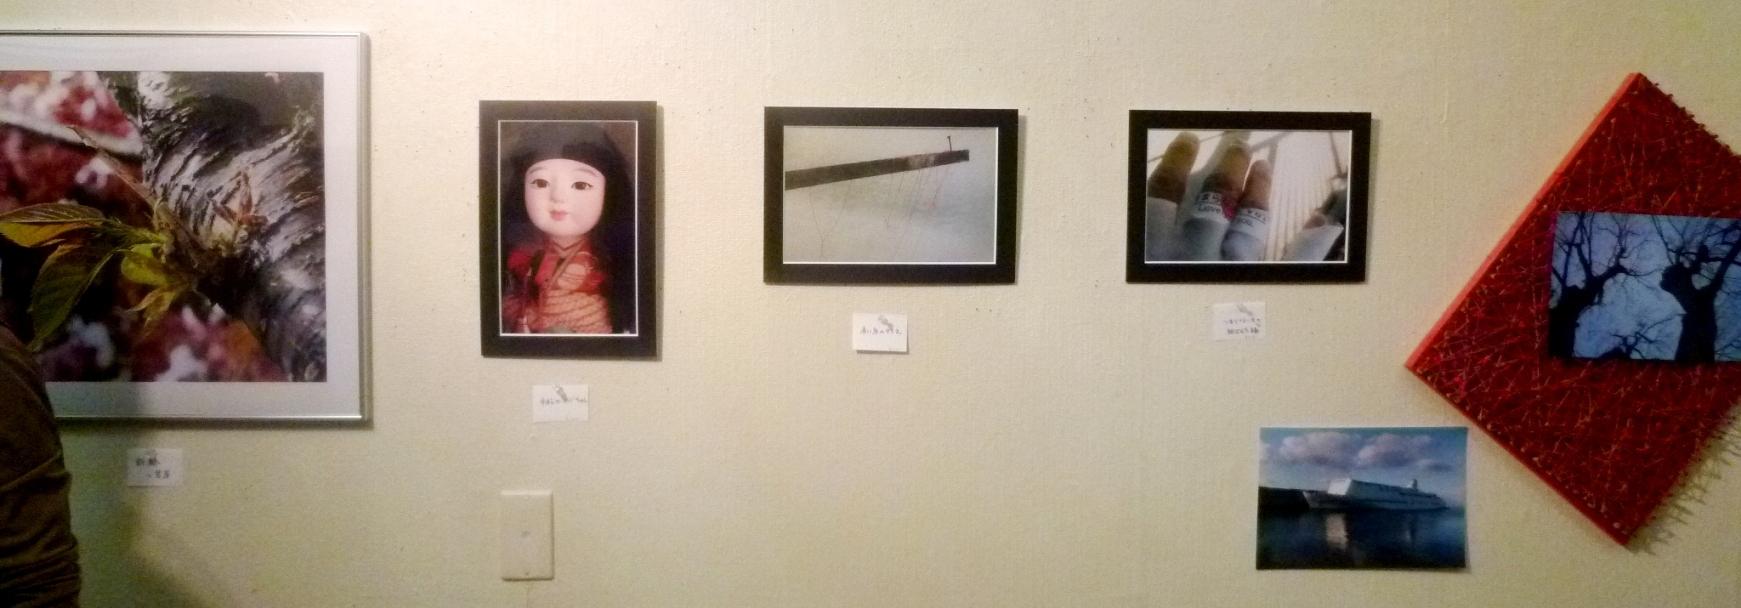 1493) 「PHOTO PRISON・3B+2O (5名の写真展)」・たぴお  4月11日(月)~4月23日(土)_f0126829_1232444.jpg